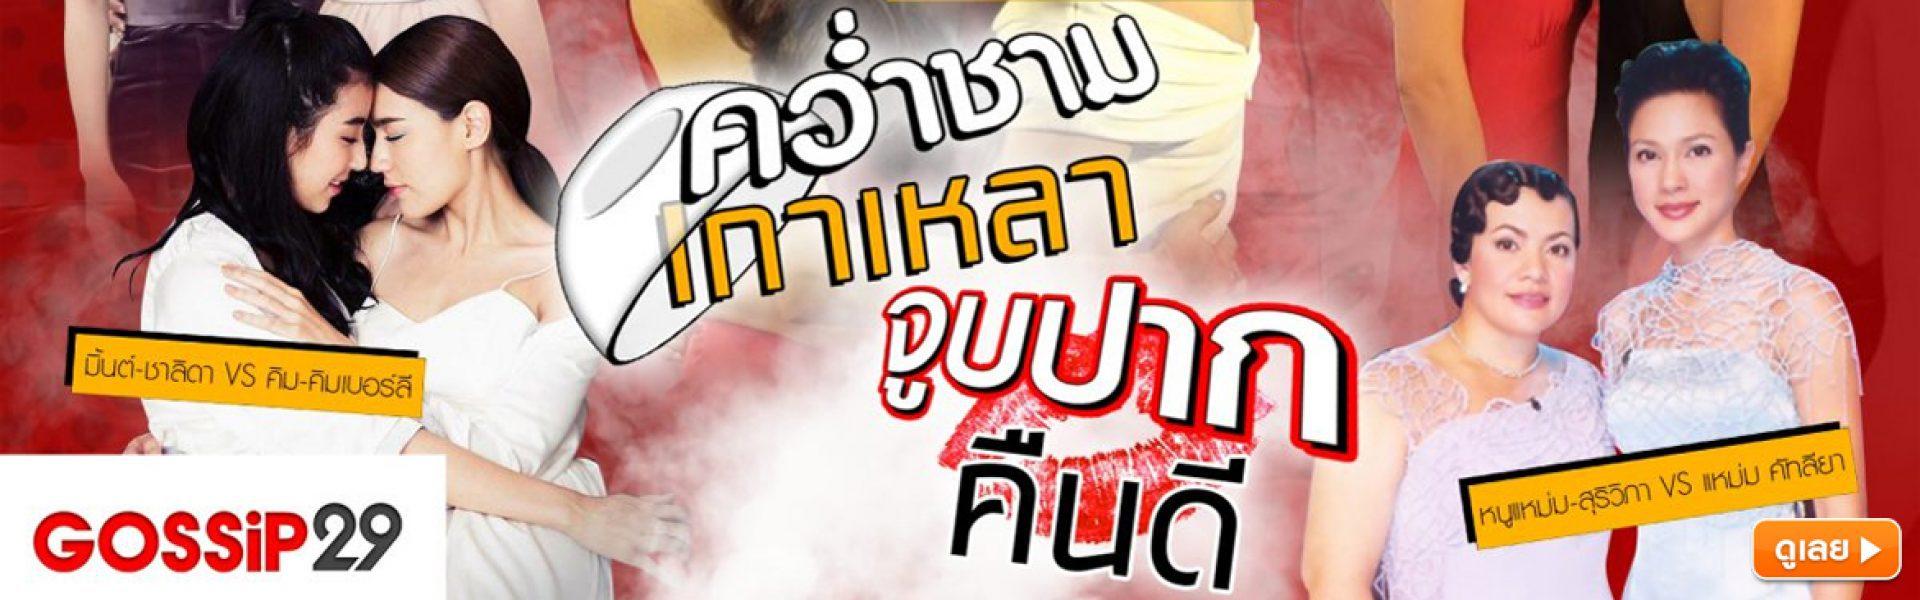 Gossip29 EP27 คว่ำชามเกาเหลา จูบปากคืนดี